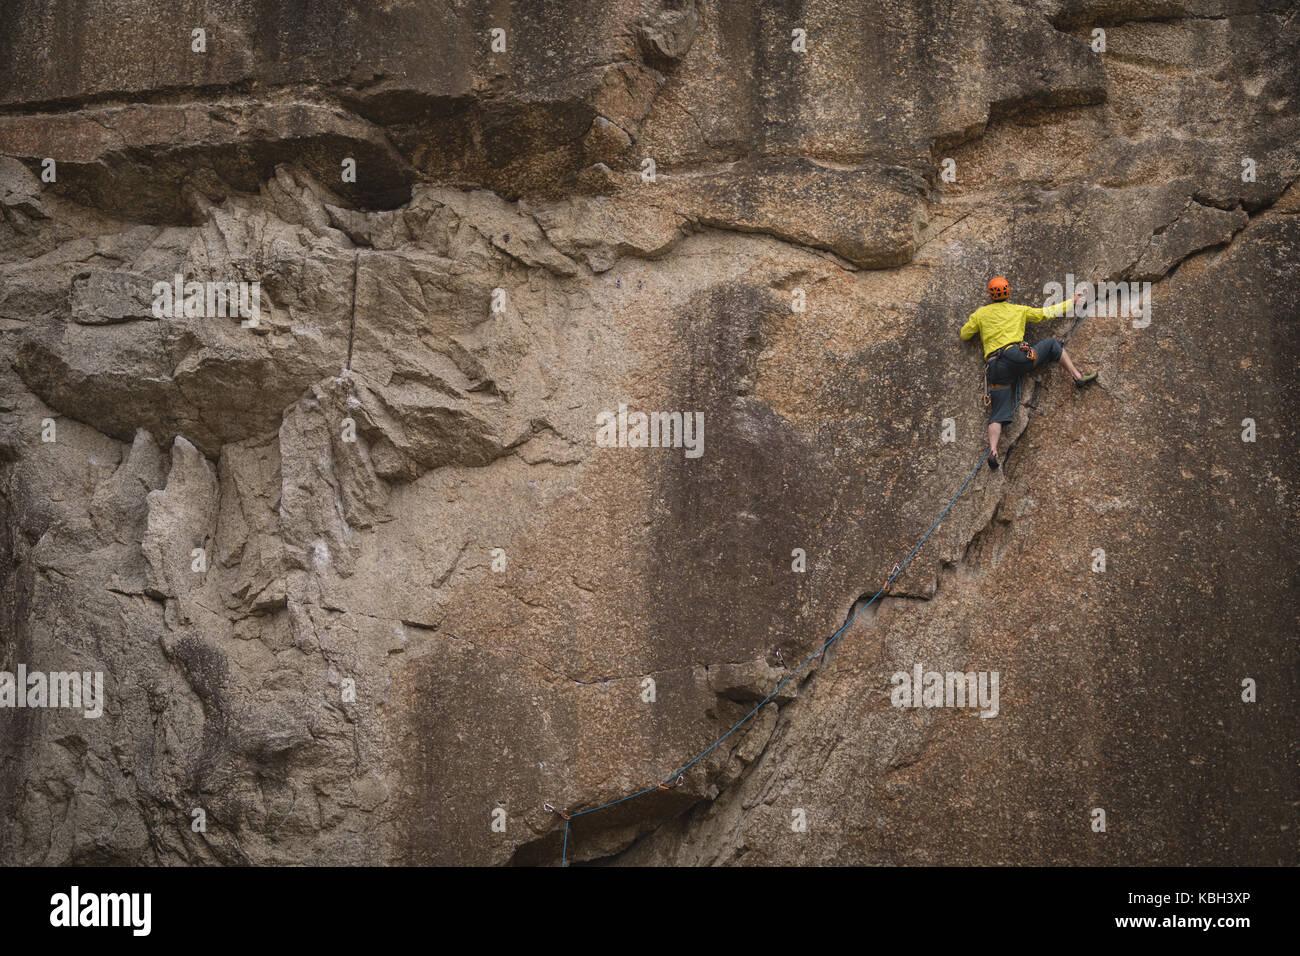 Rear view of man climbing mountain - Stock Image